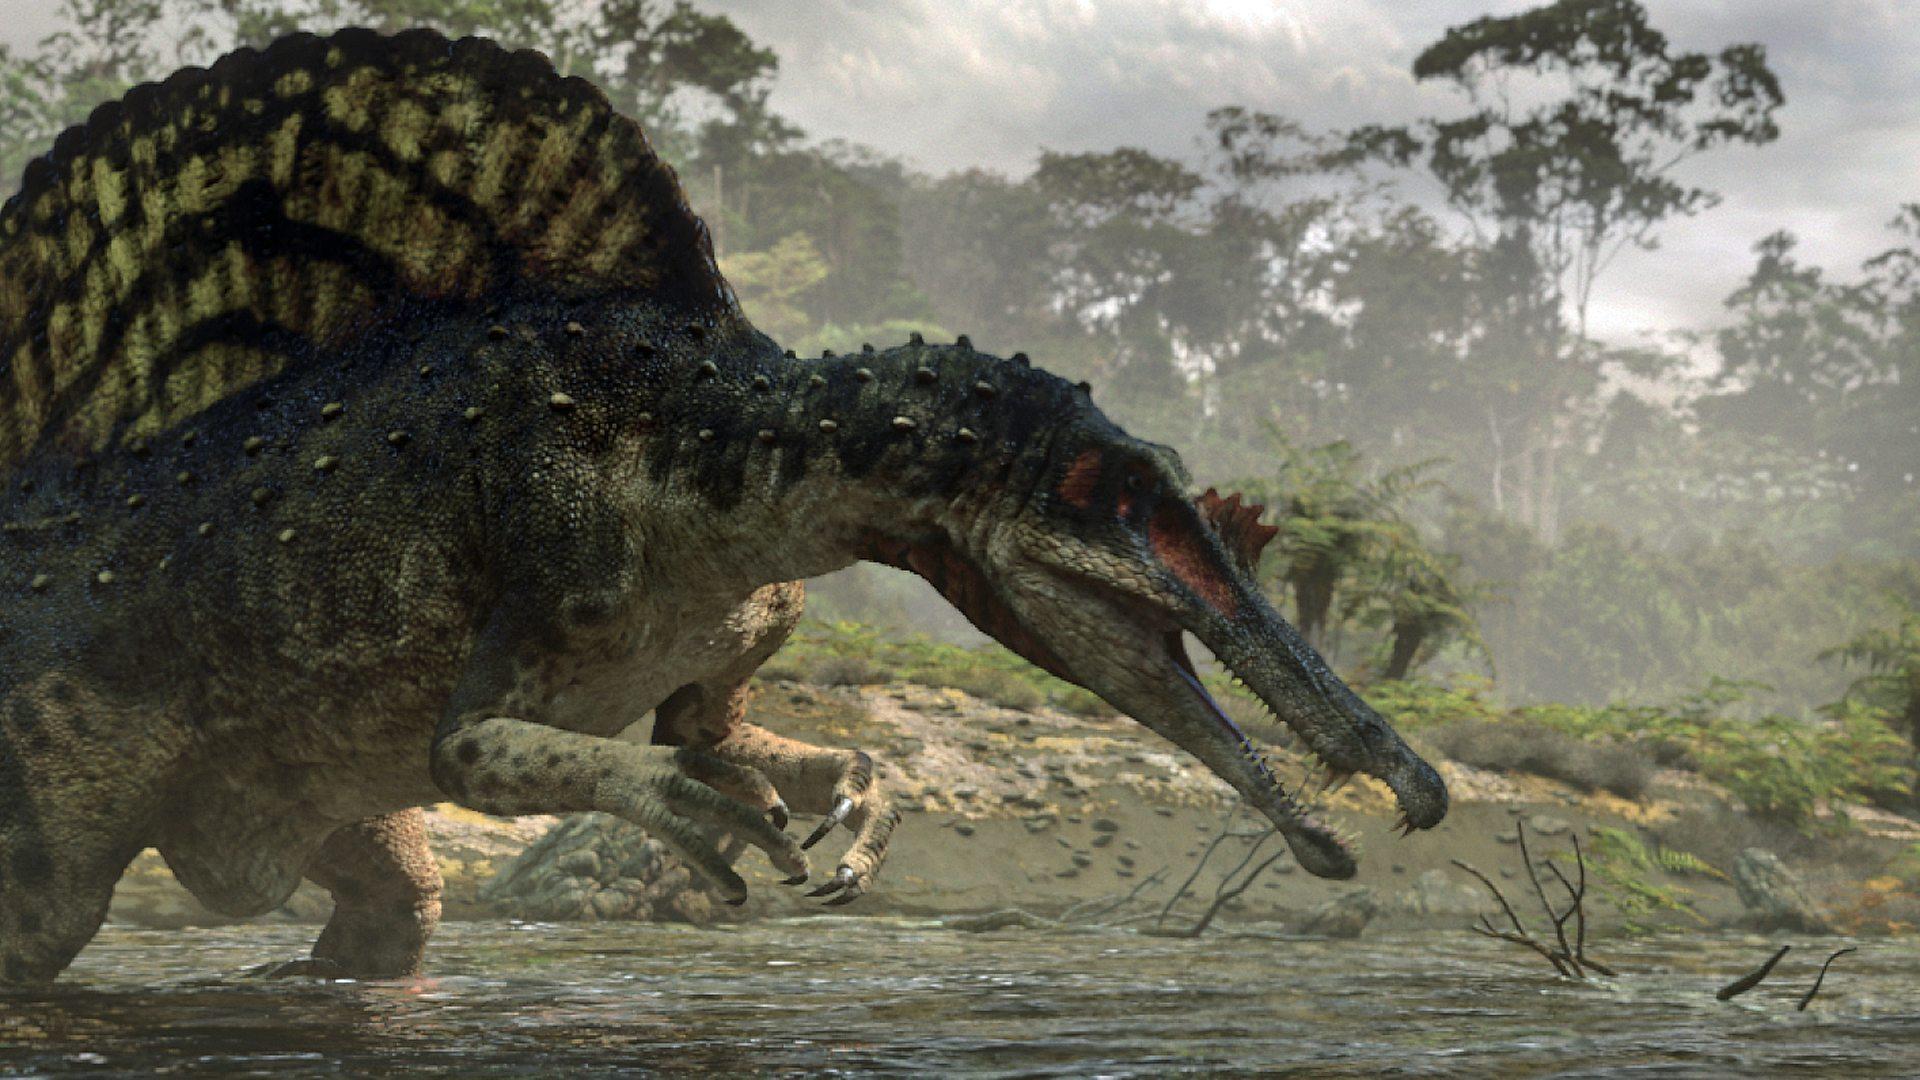 planet dinosaur carcharodontosaurus wwwpixsharkcom